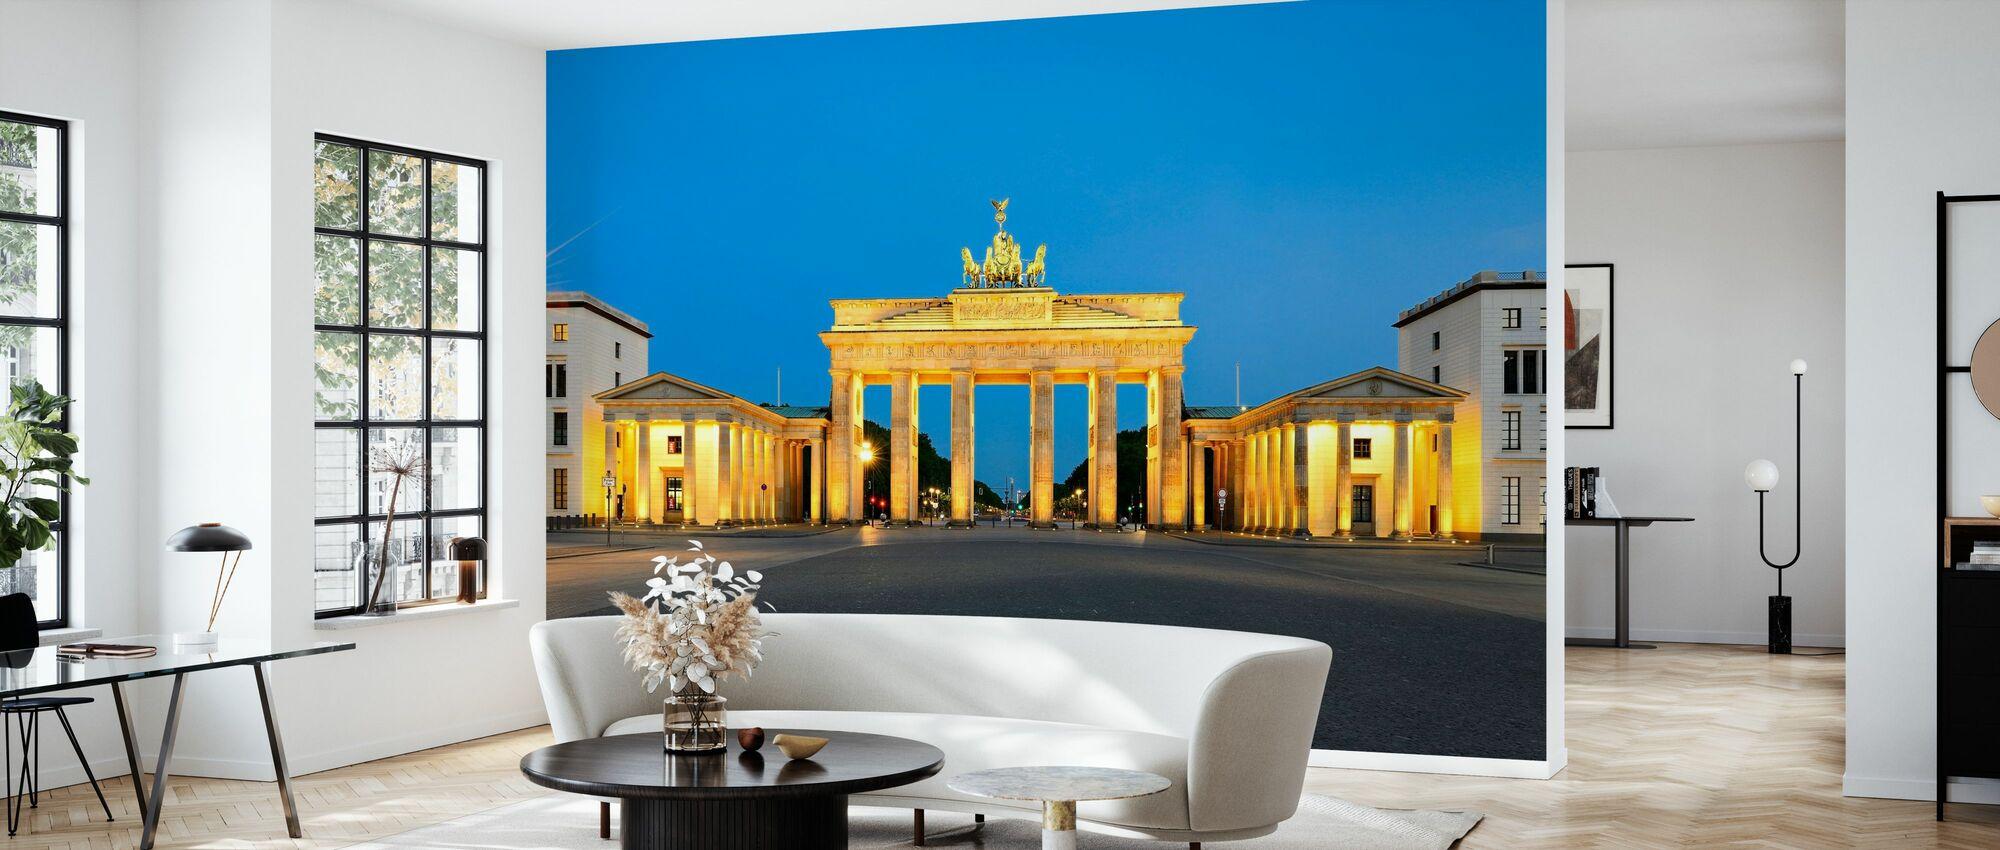 Paris Square with Brandenburg Gate - Wallpaper - Living Room